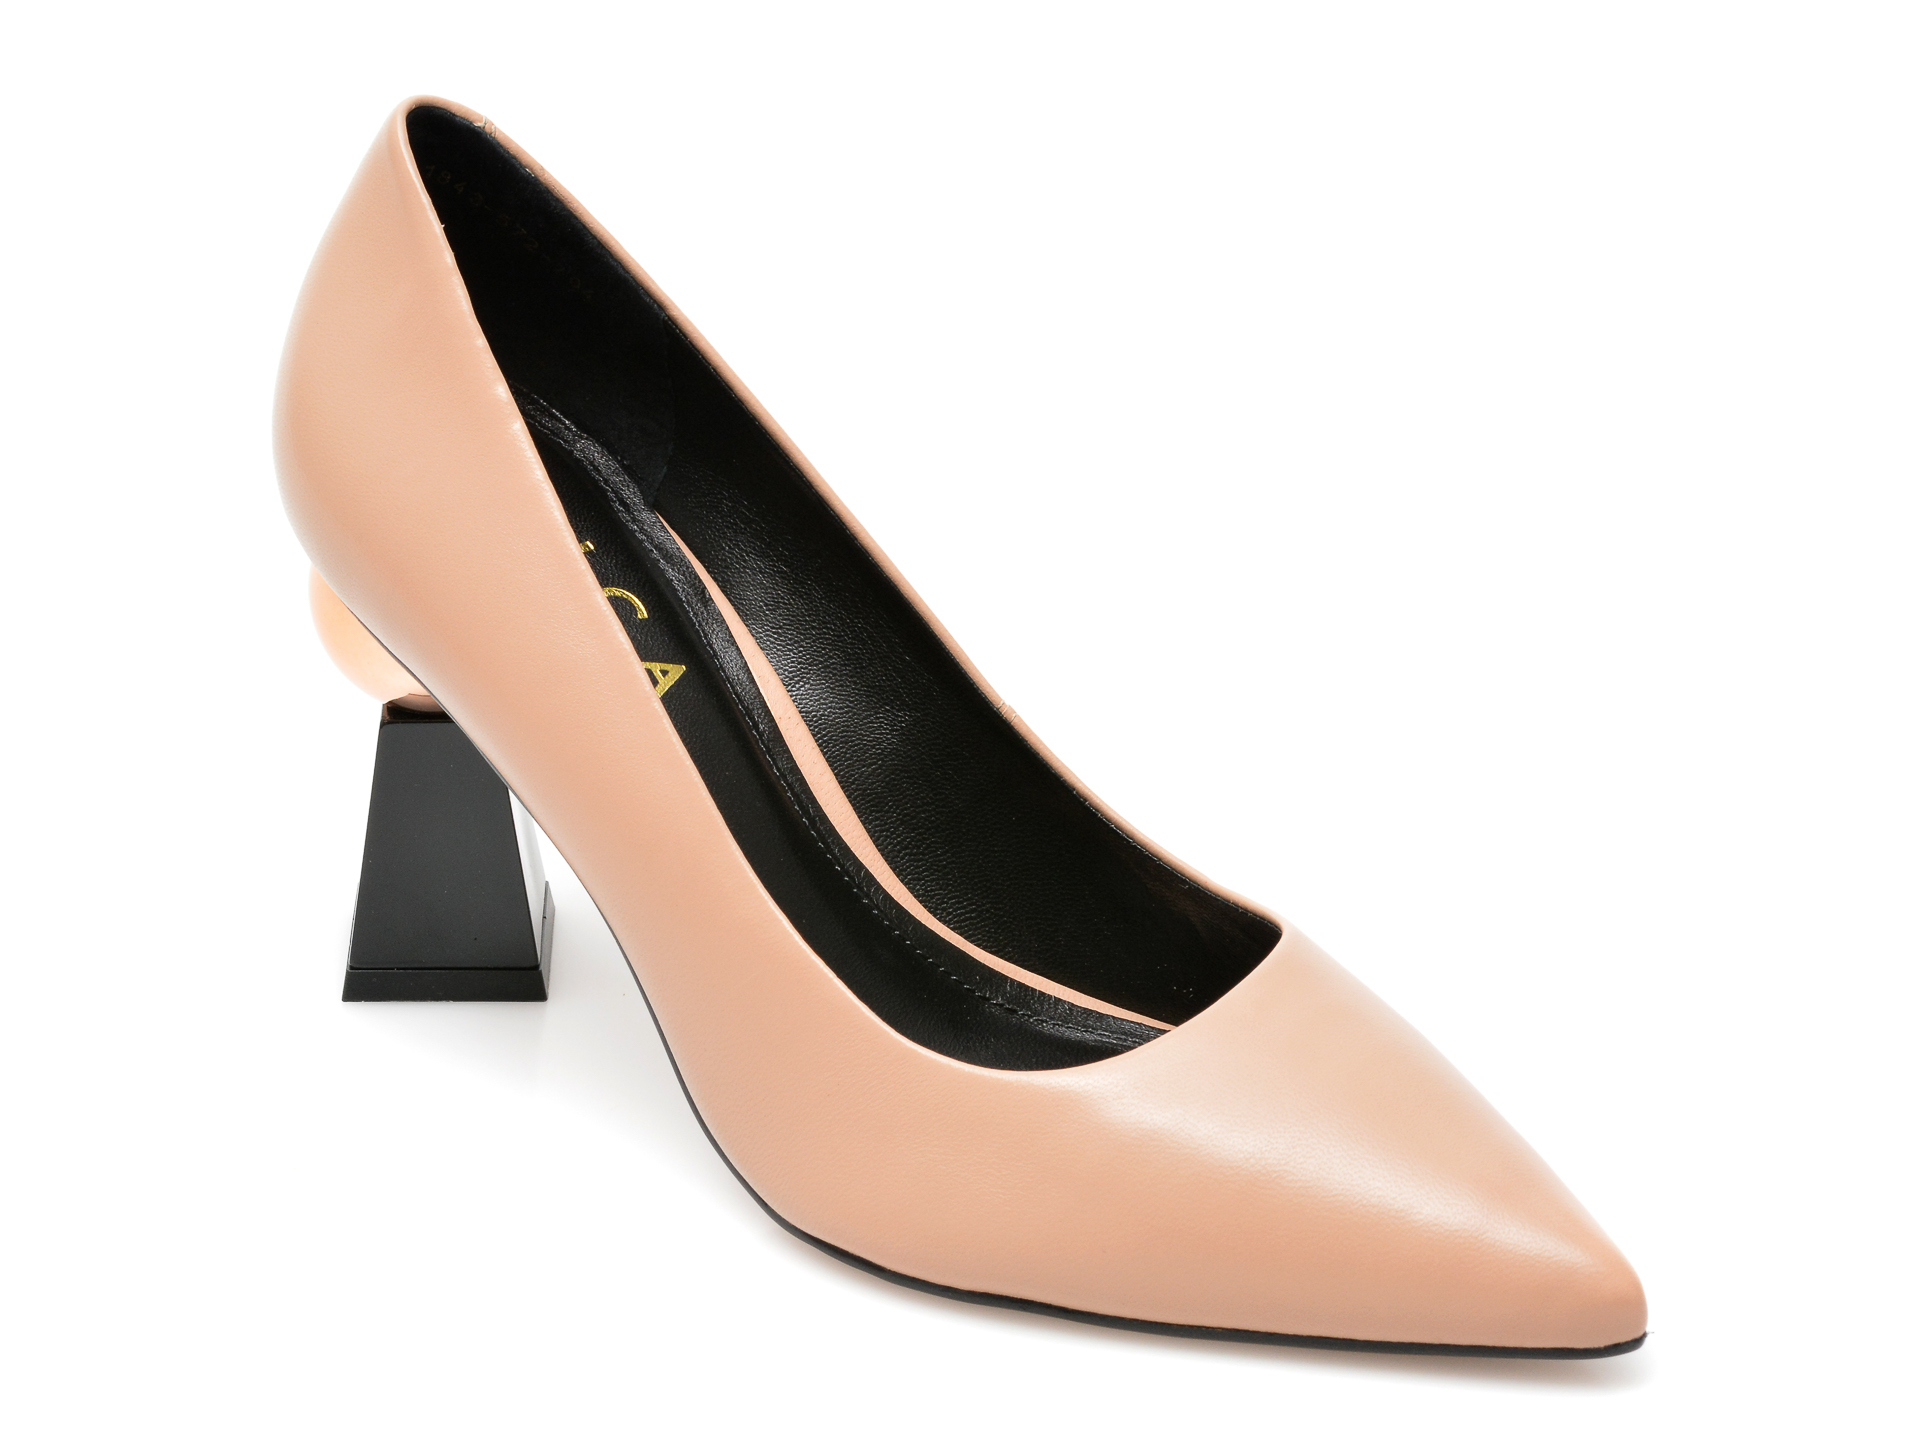 Pantofi EPICA bej, 1843704, din piele naturala imagine otter.ro